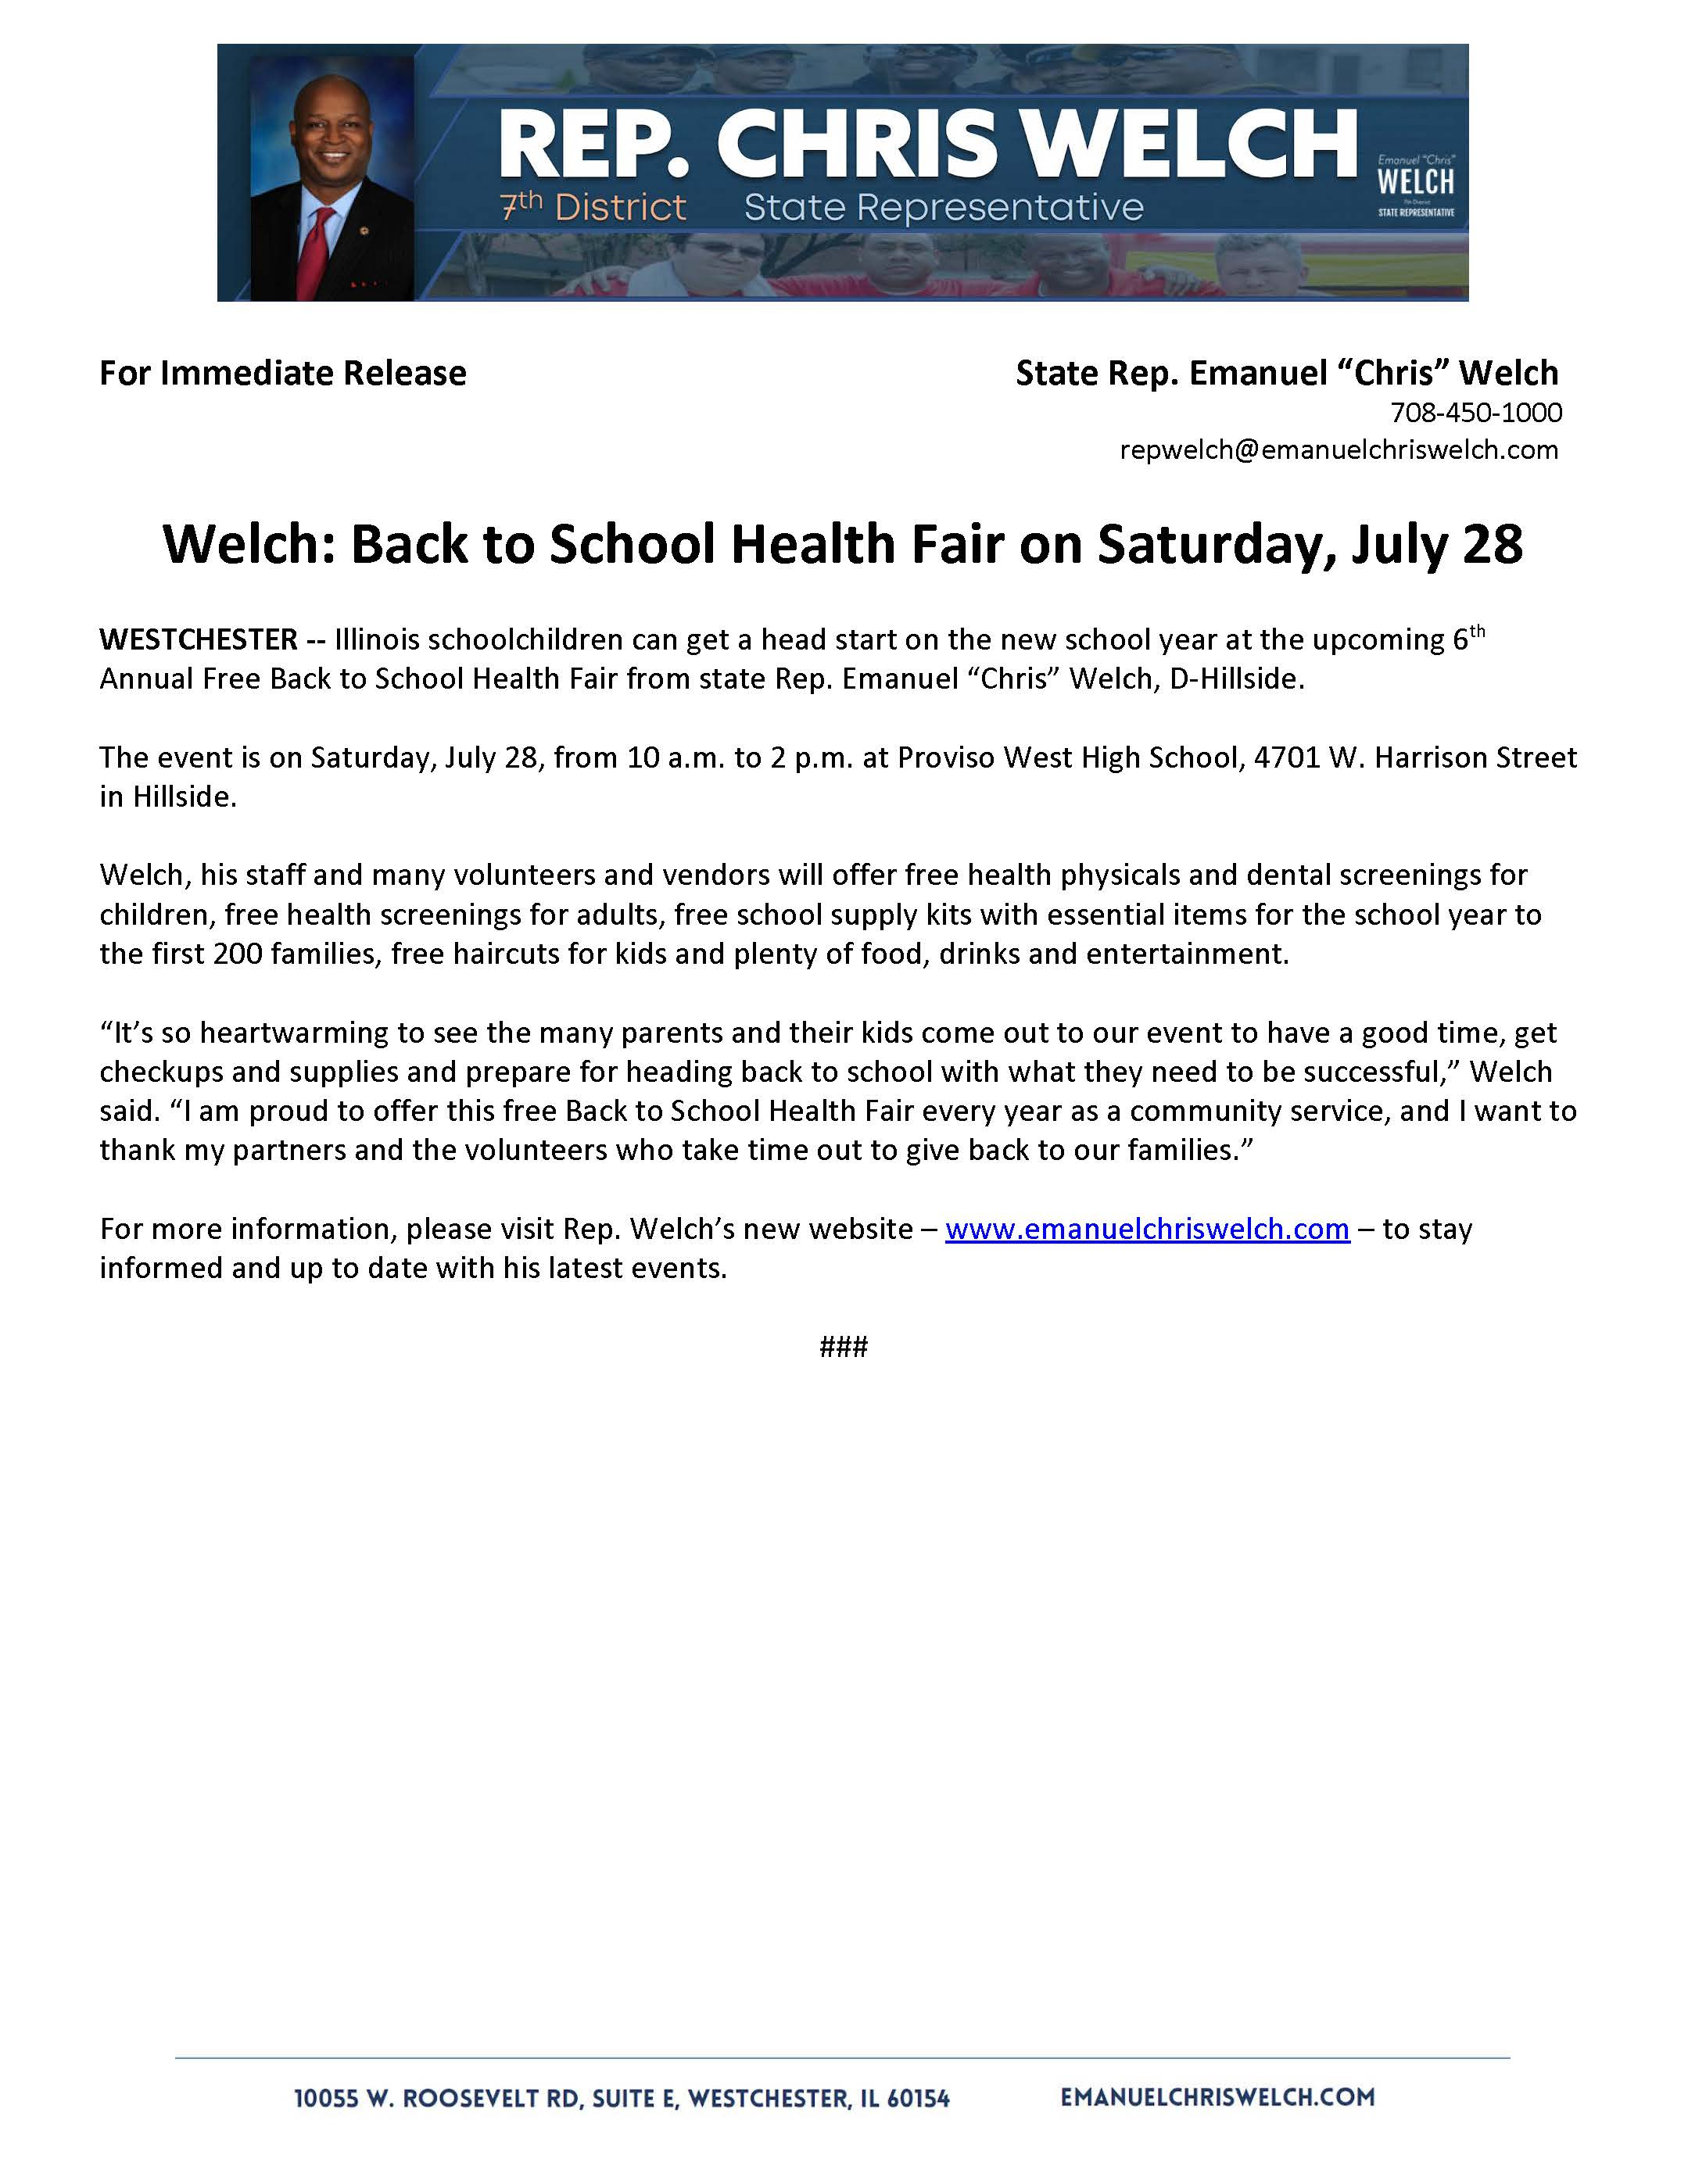 Welch: Back to School Health Fair on Saturday, July 28   (July 27, 2018)